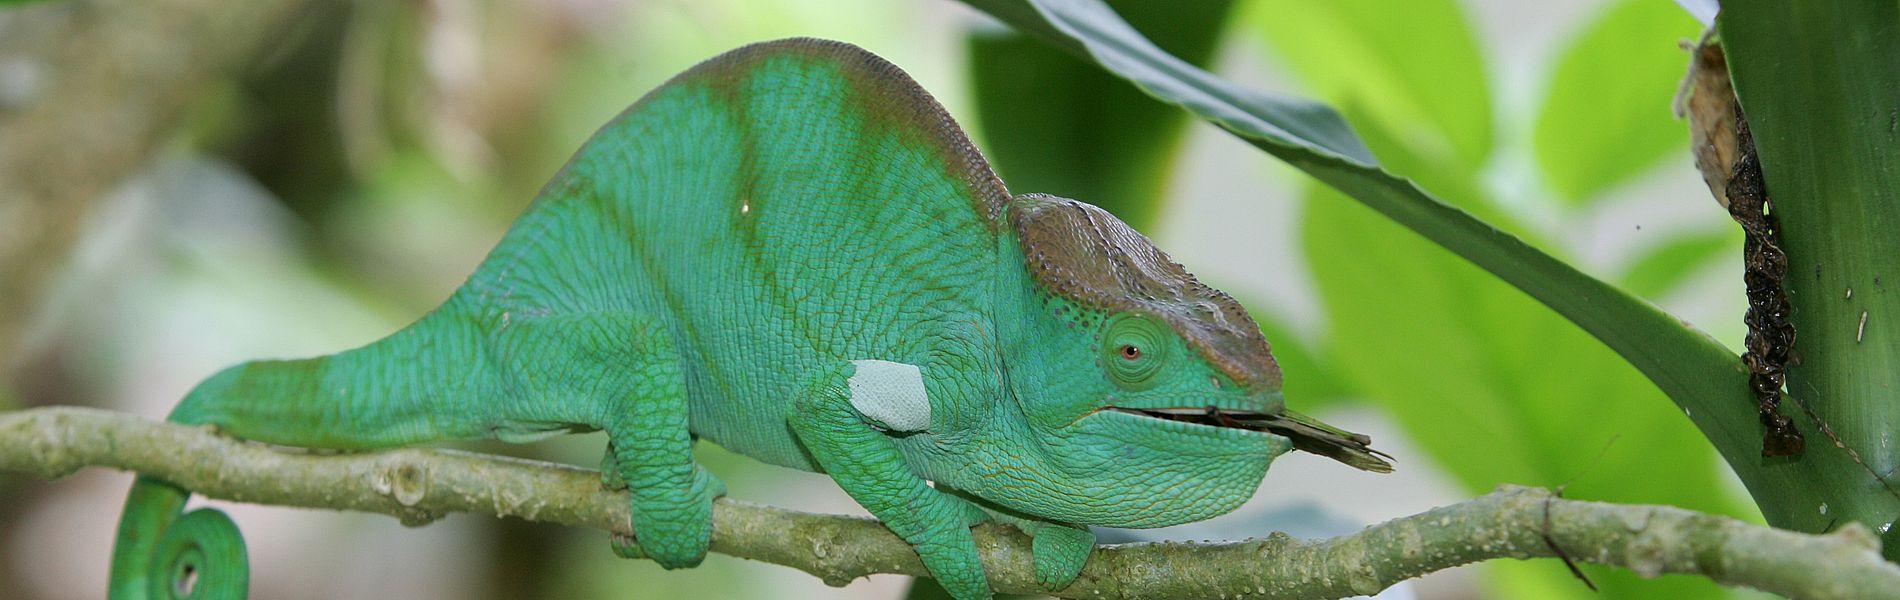 Madagaskar Wald Dschungel Chamäleon